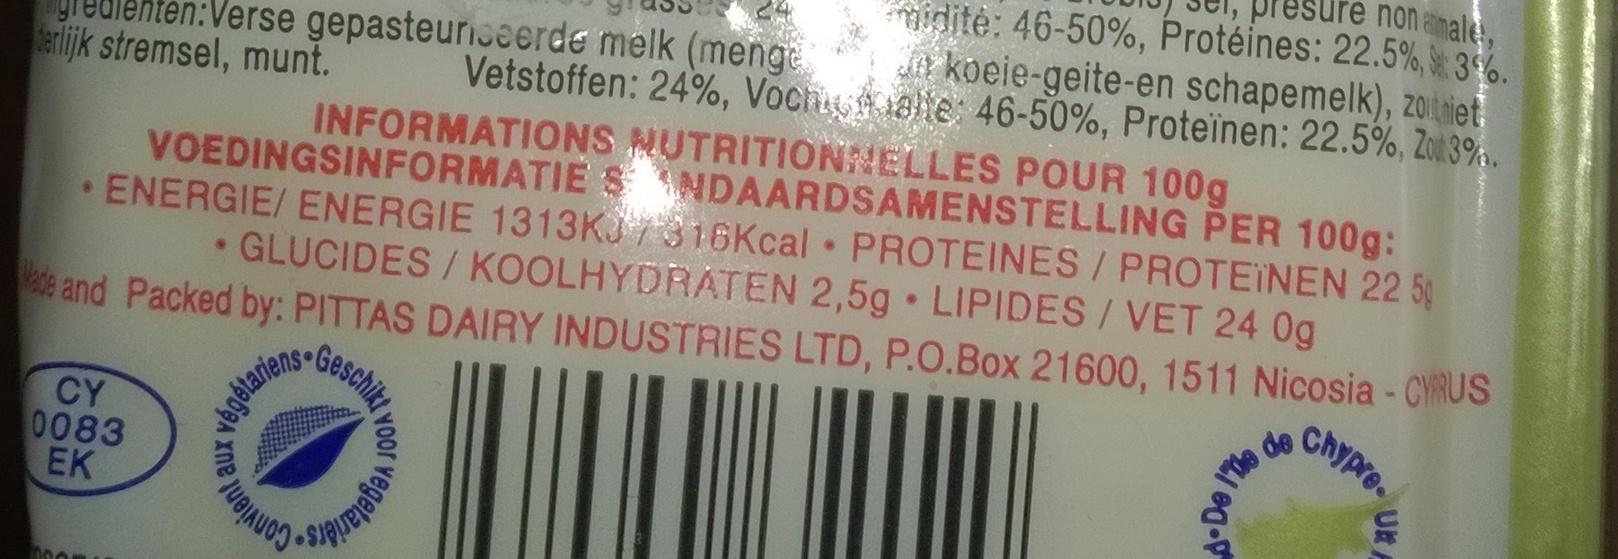 Halloumi (24% MG) - Informations nutritionnelles - fr